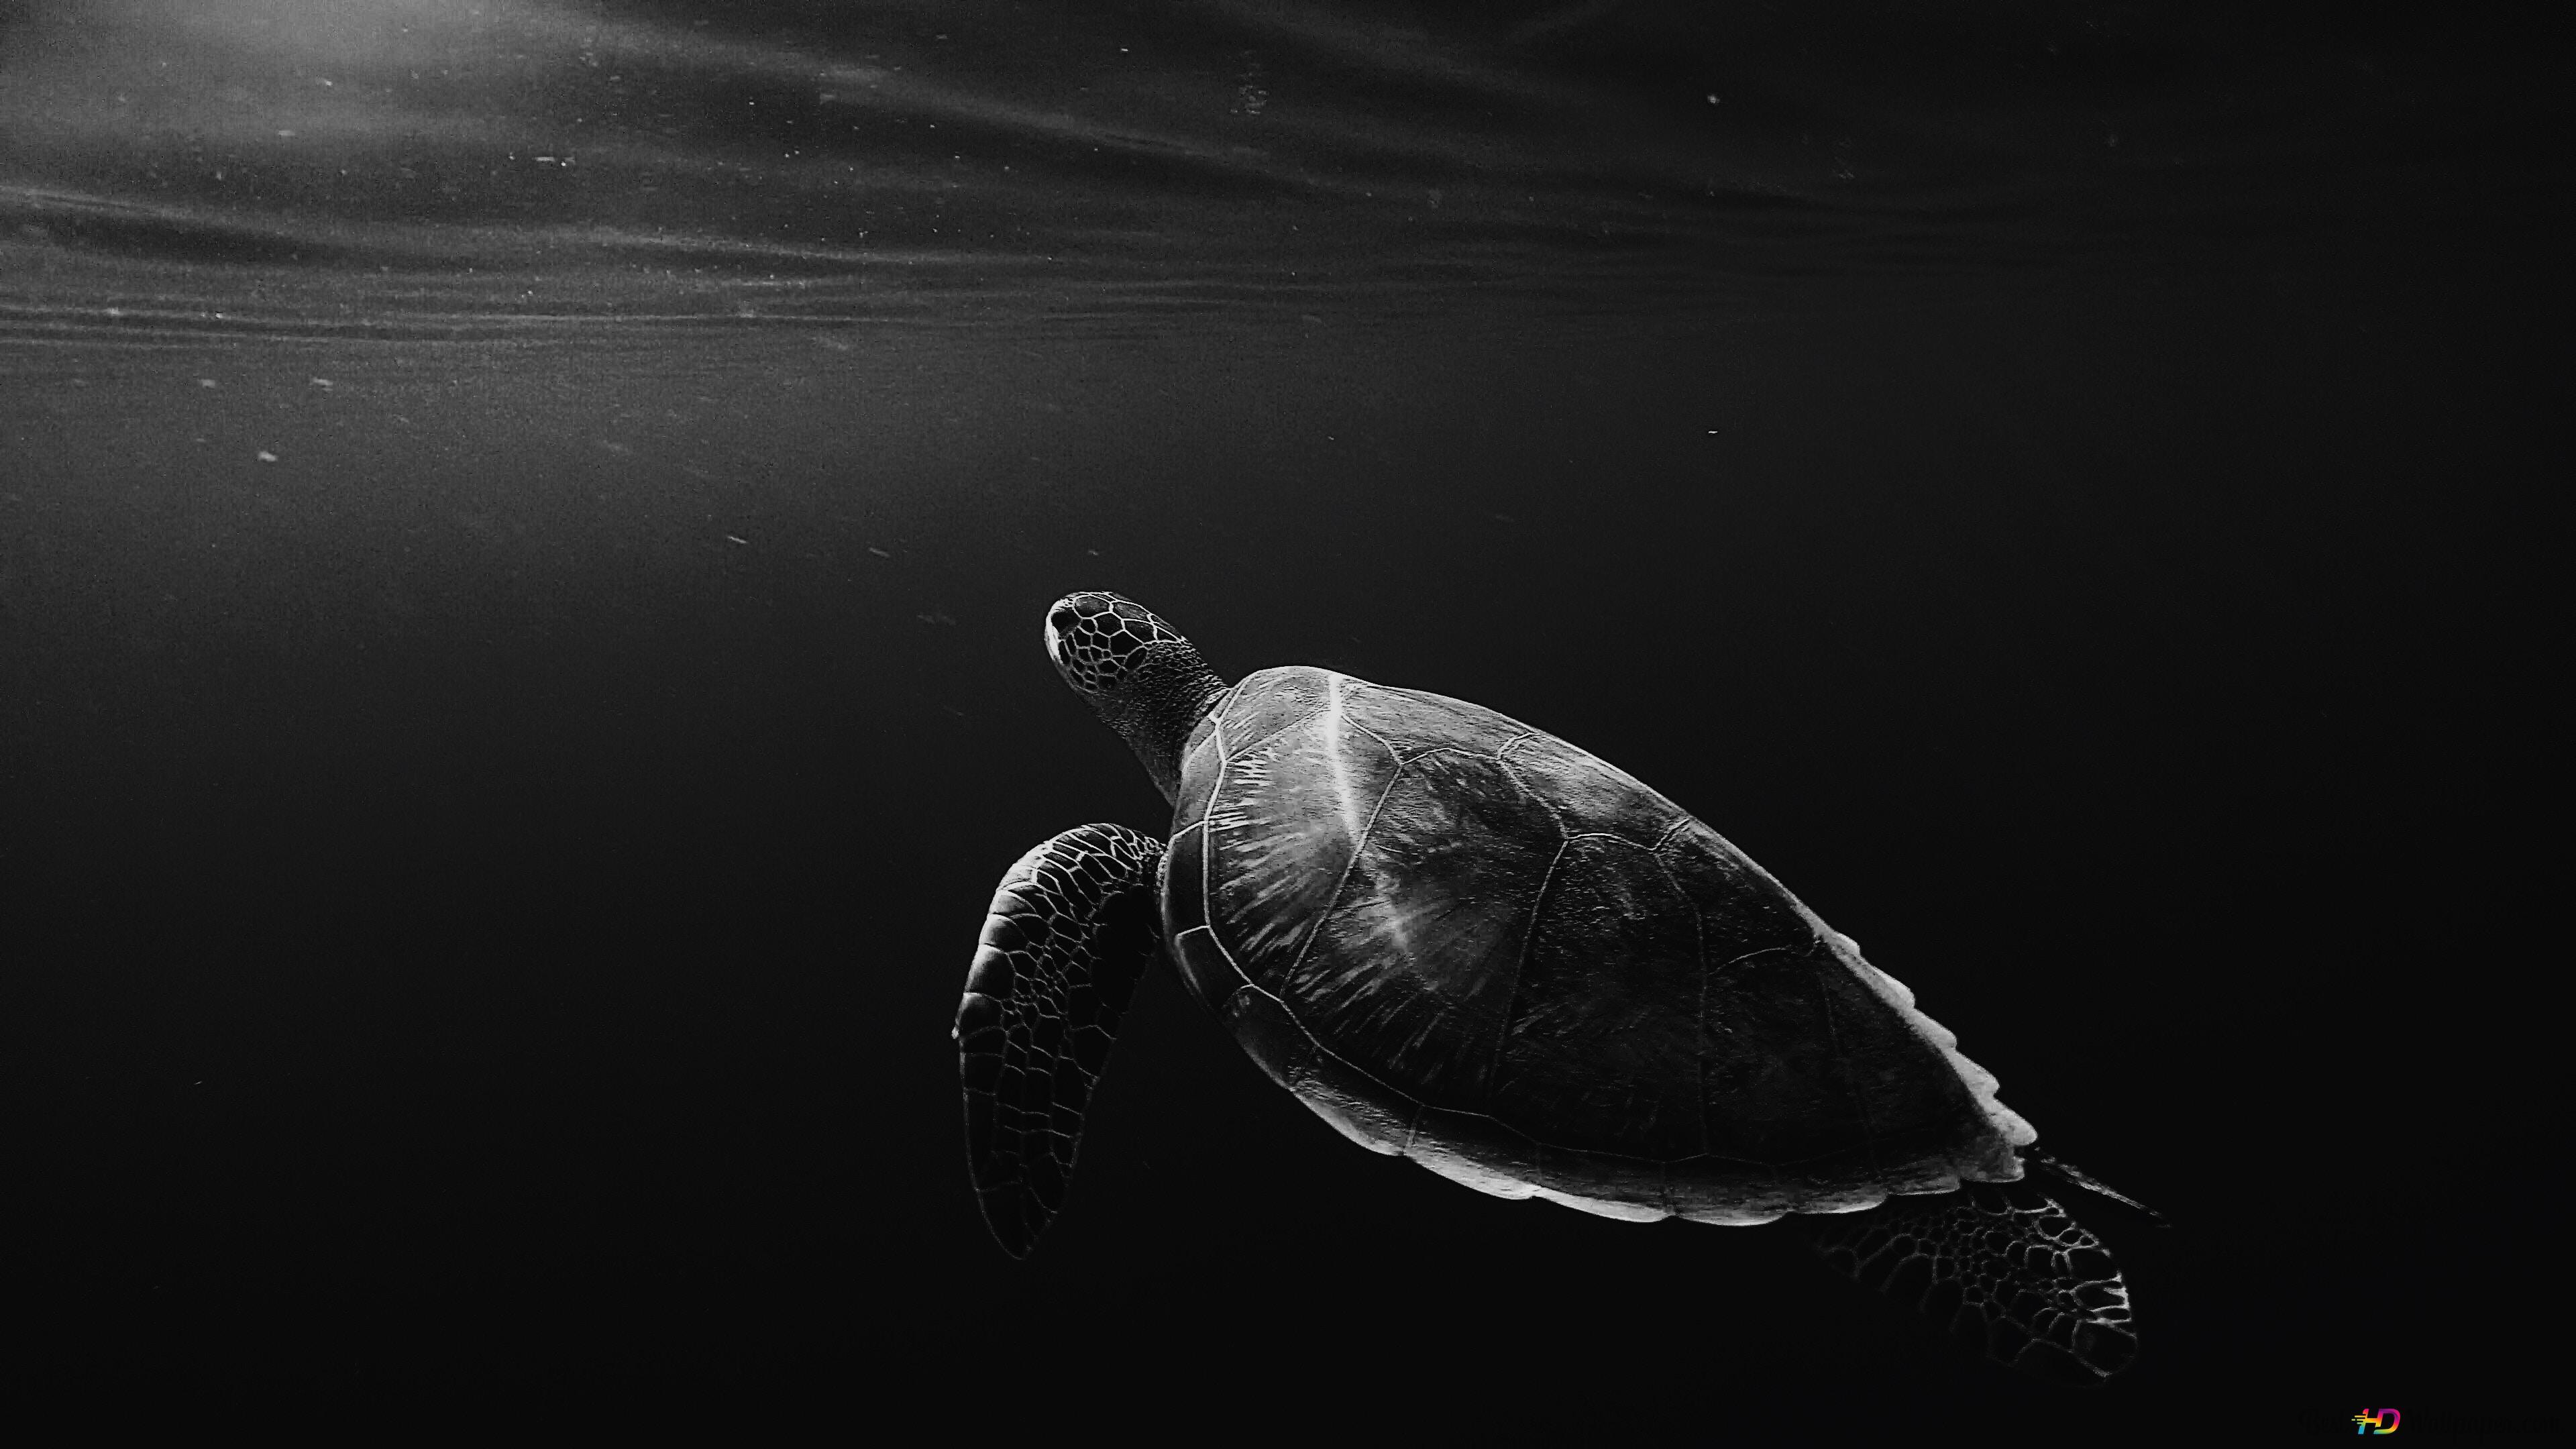 Sea Turtle Hd Wallpaper Download